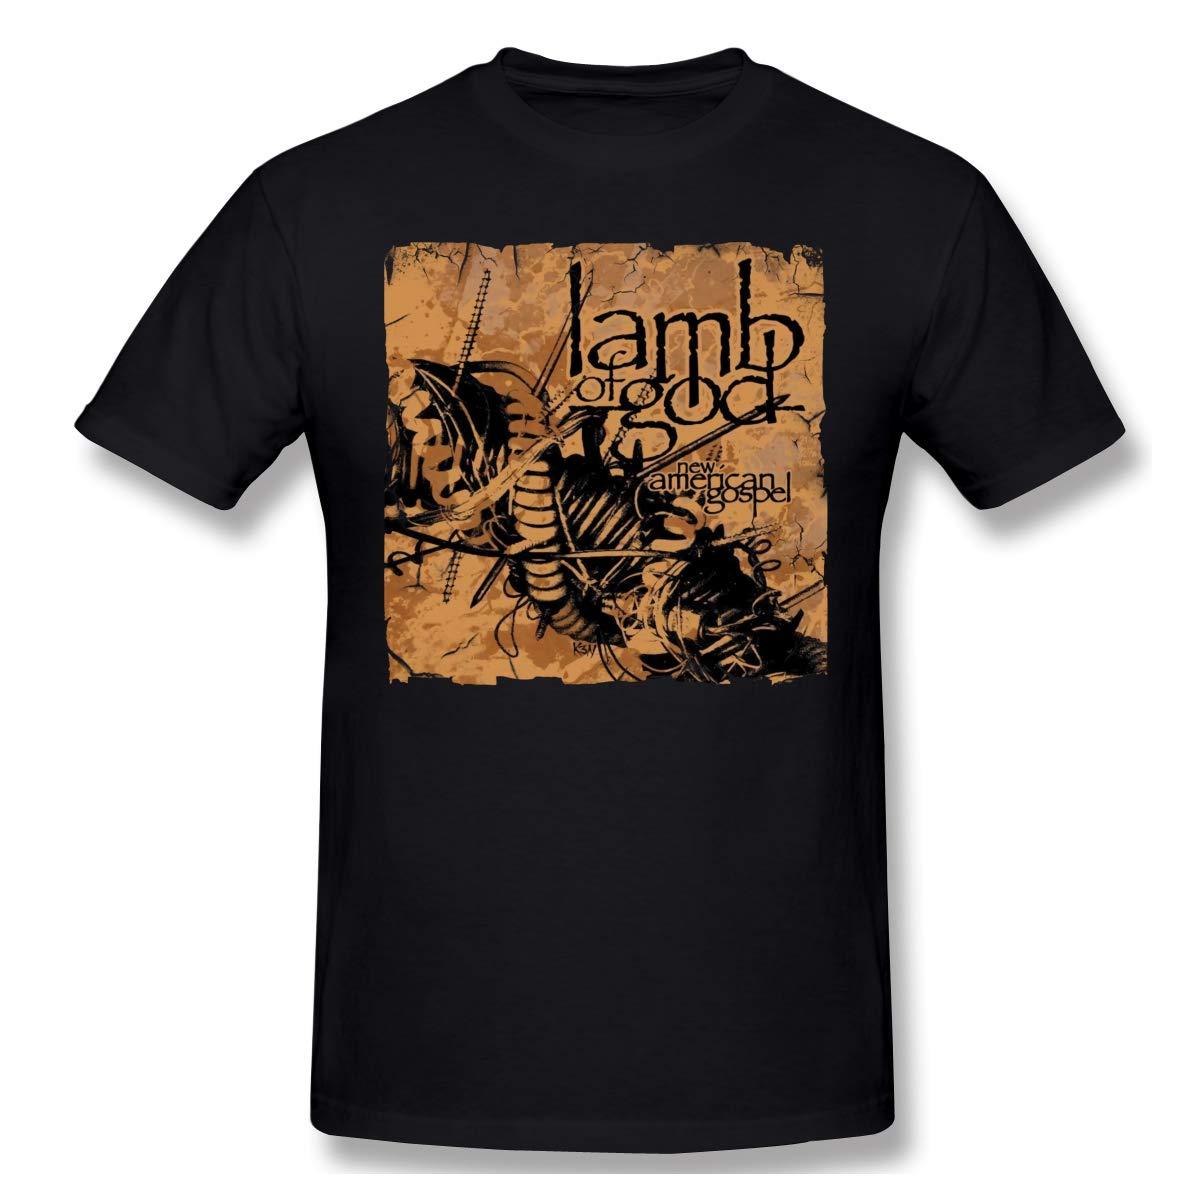 Lamb of God New American Gospel Comfortable Music Theme Classic Men's Short Sleeve T-Shirt